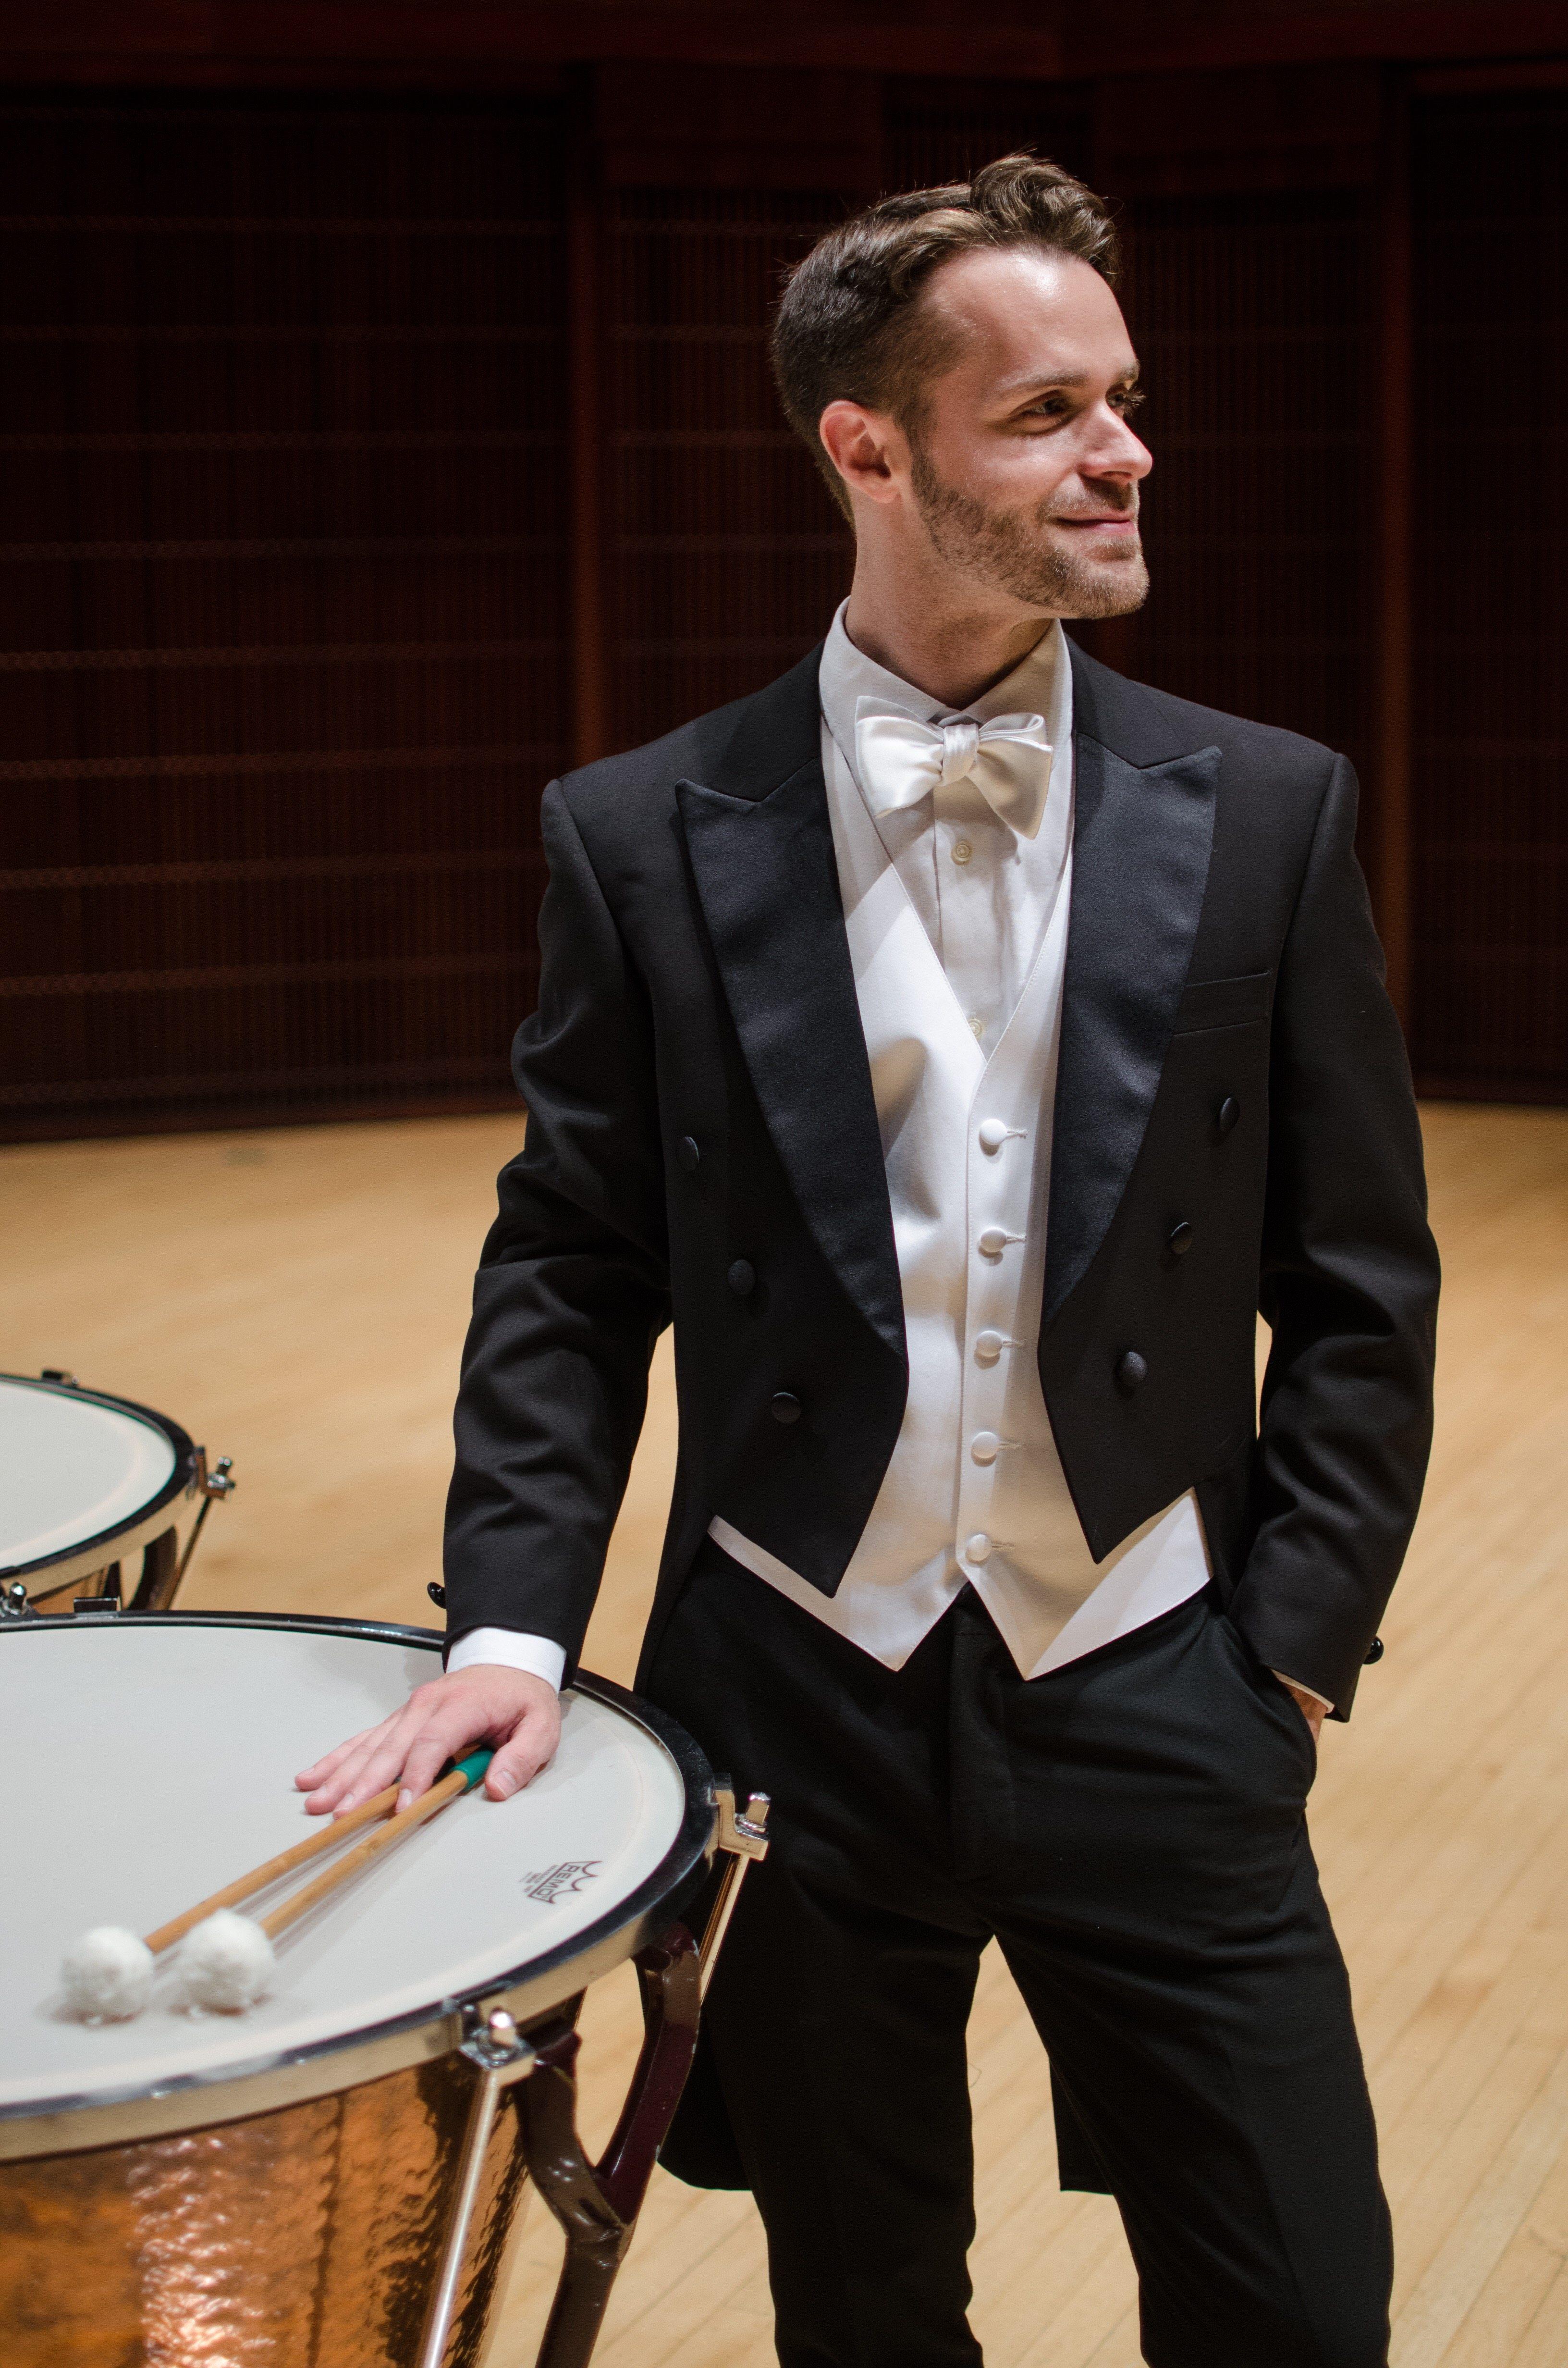 gay-express-steven-logan-auckland-philharmonia-orchestra